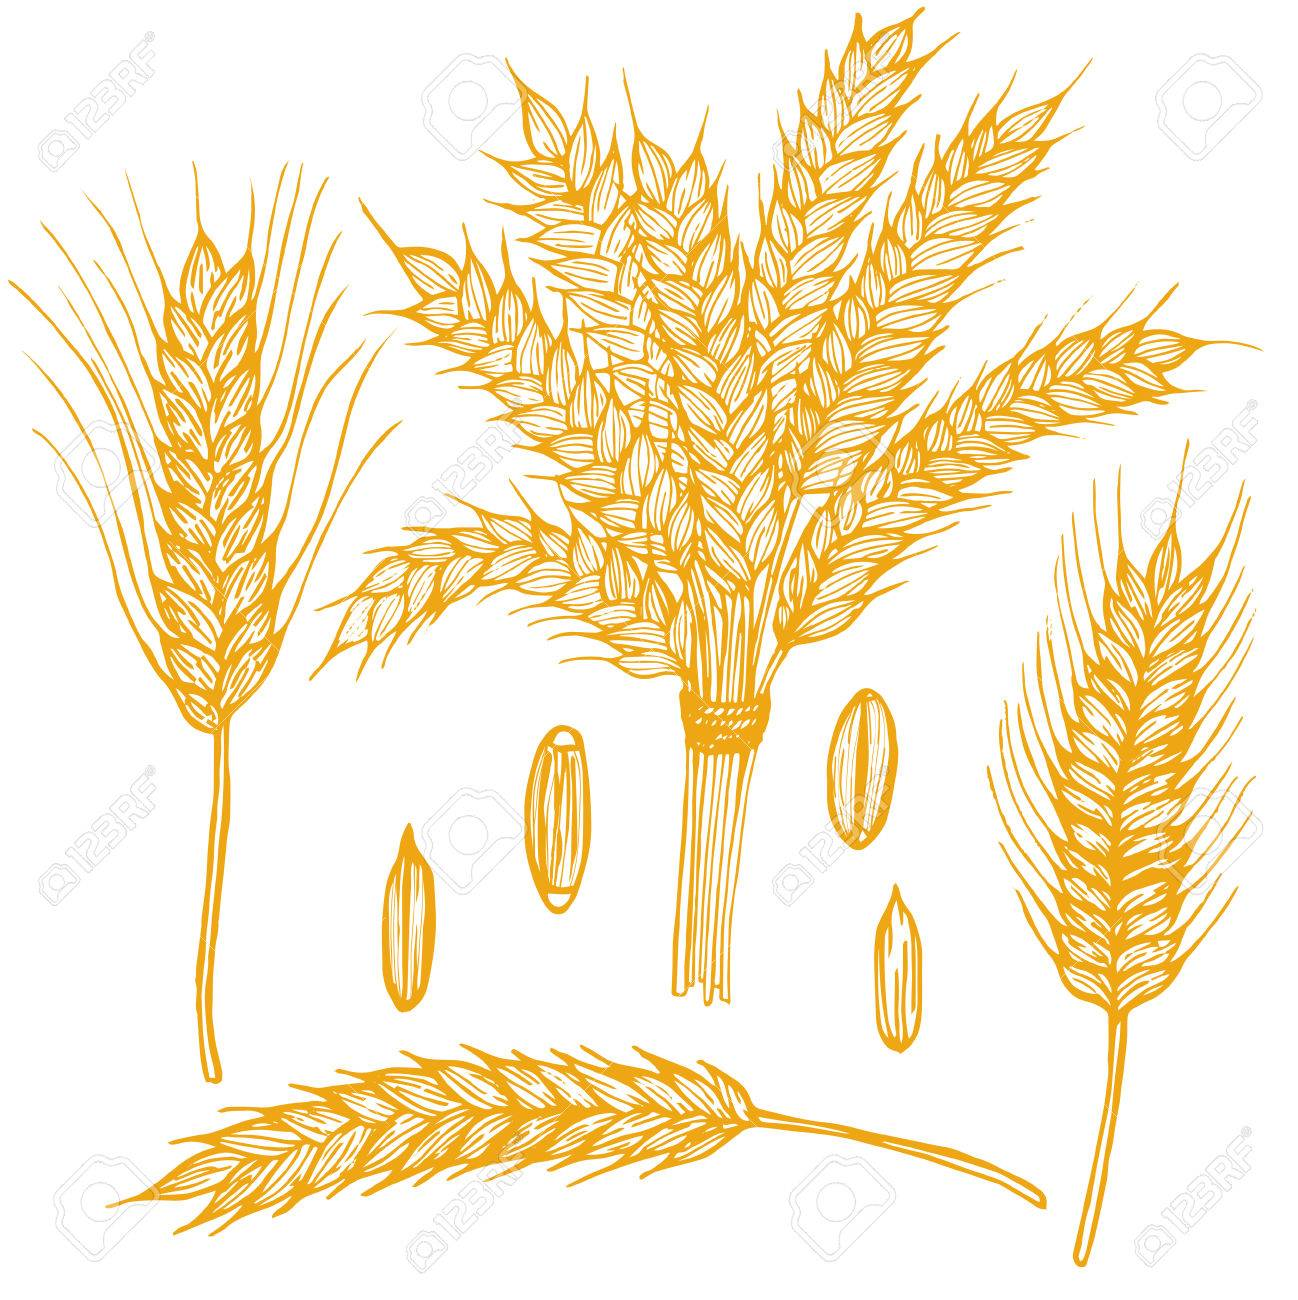 Wheat Ears Hand Draw Sketch. - 61330860